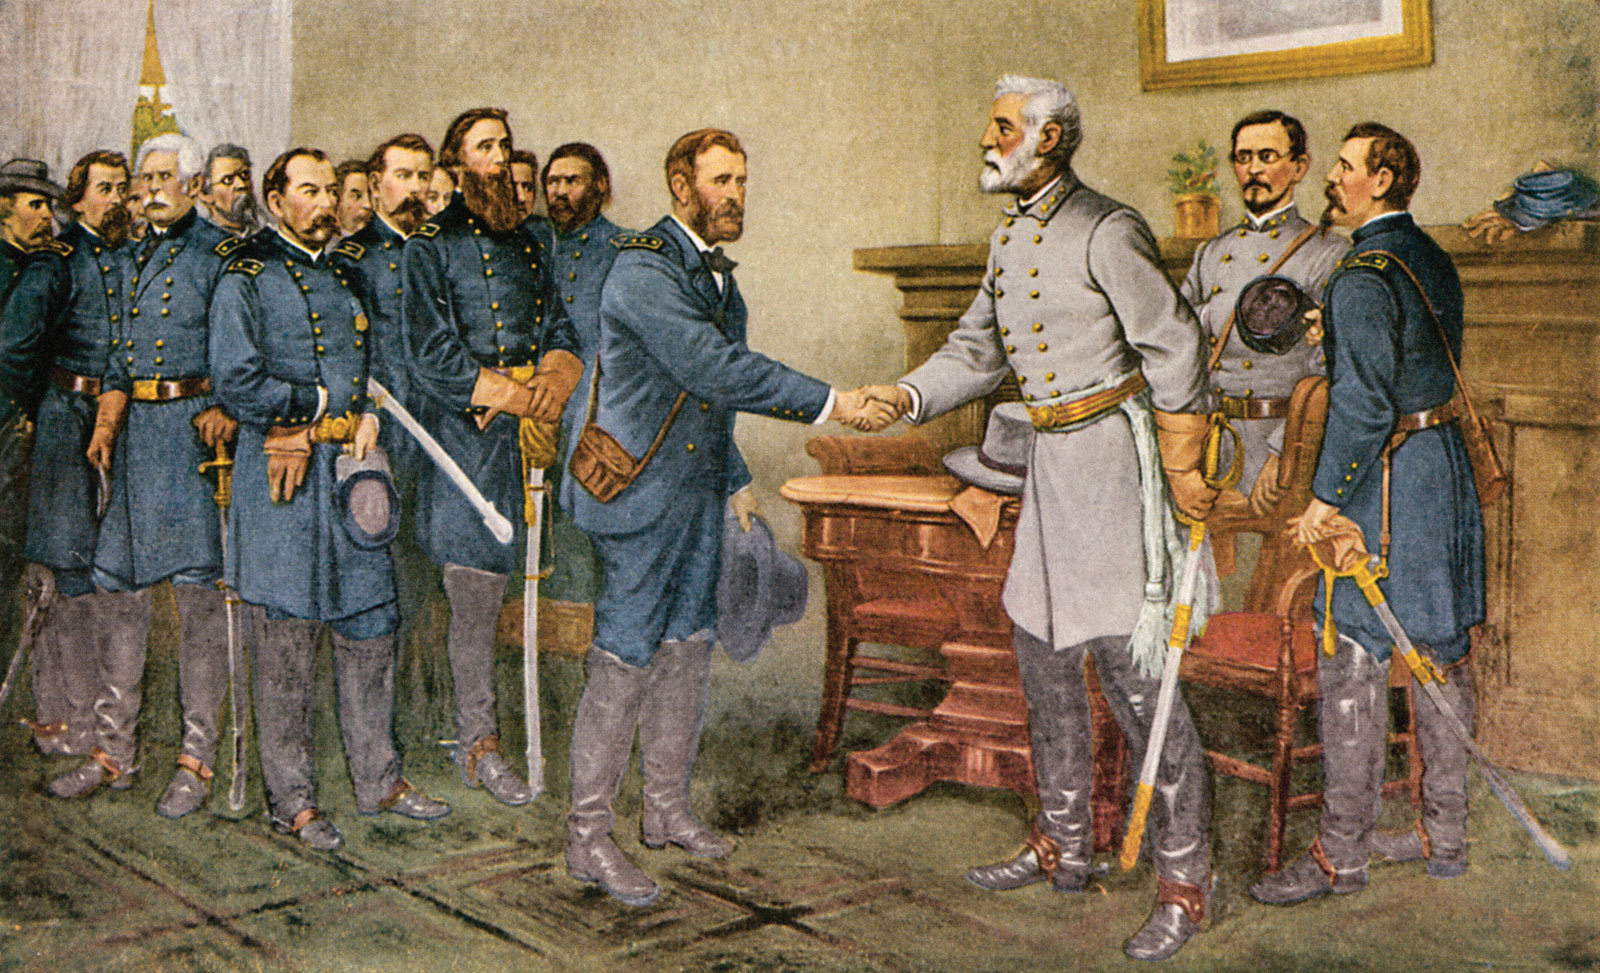 General_Robert_E._Lee_surrenders_at_Appomattox_Court_House_1865.jpg